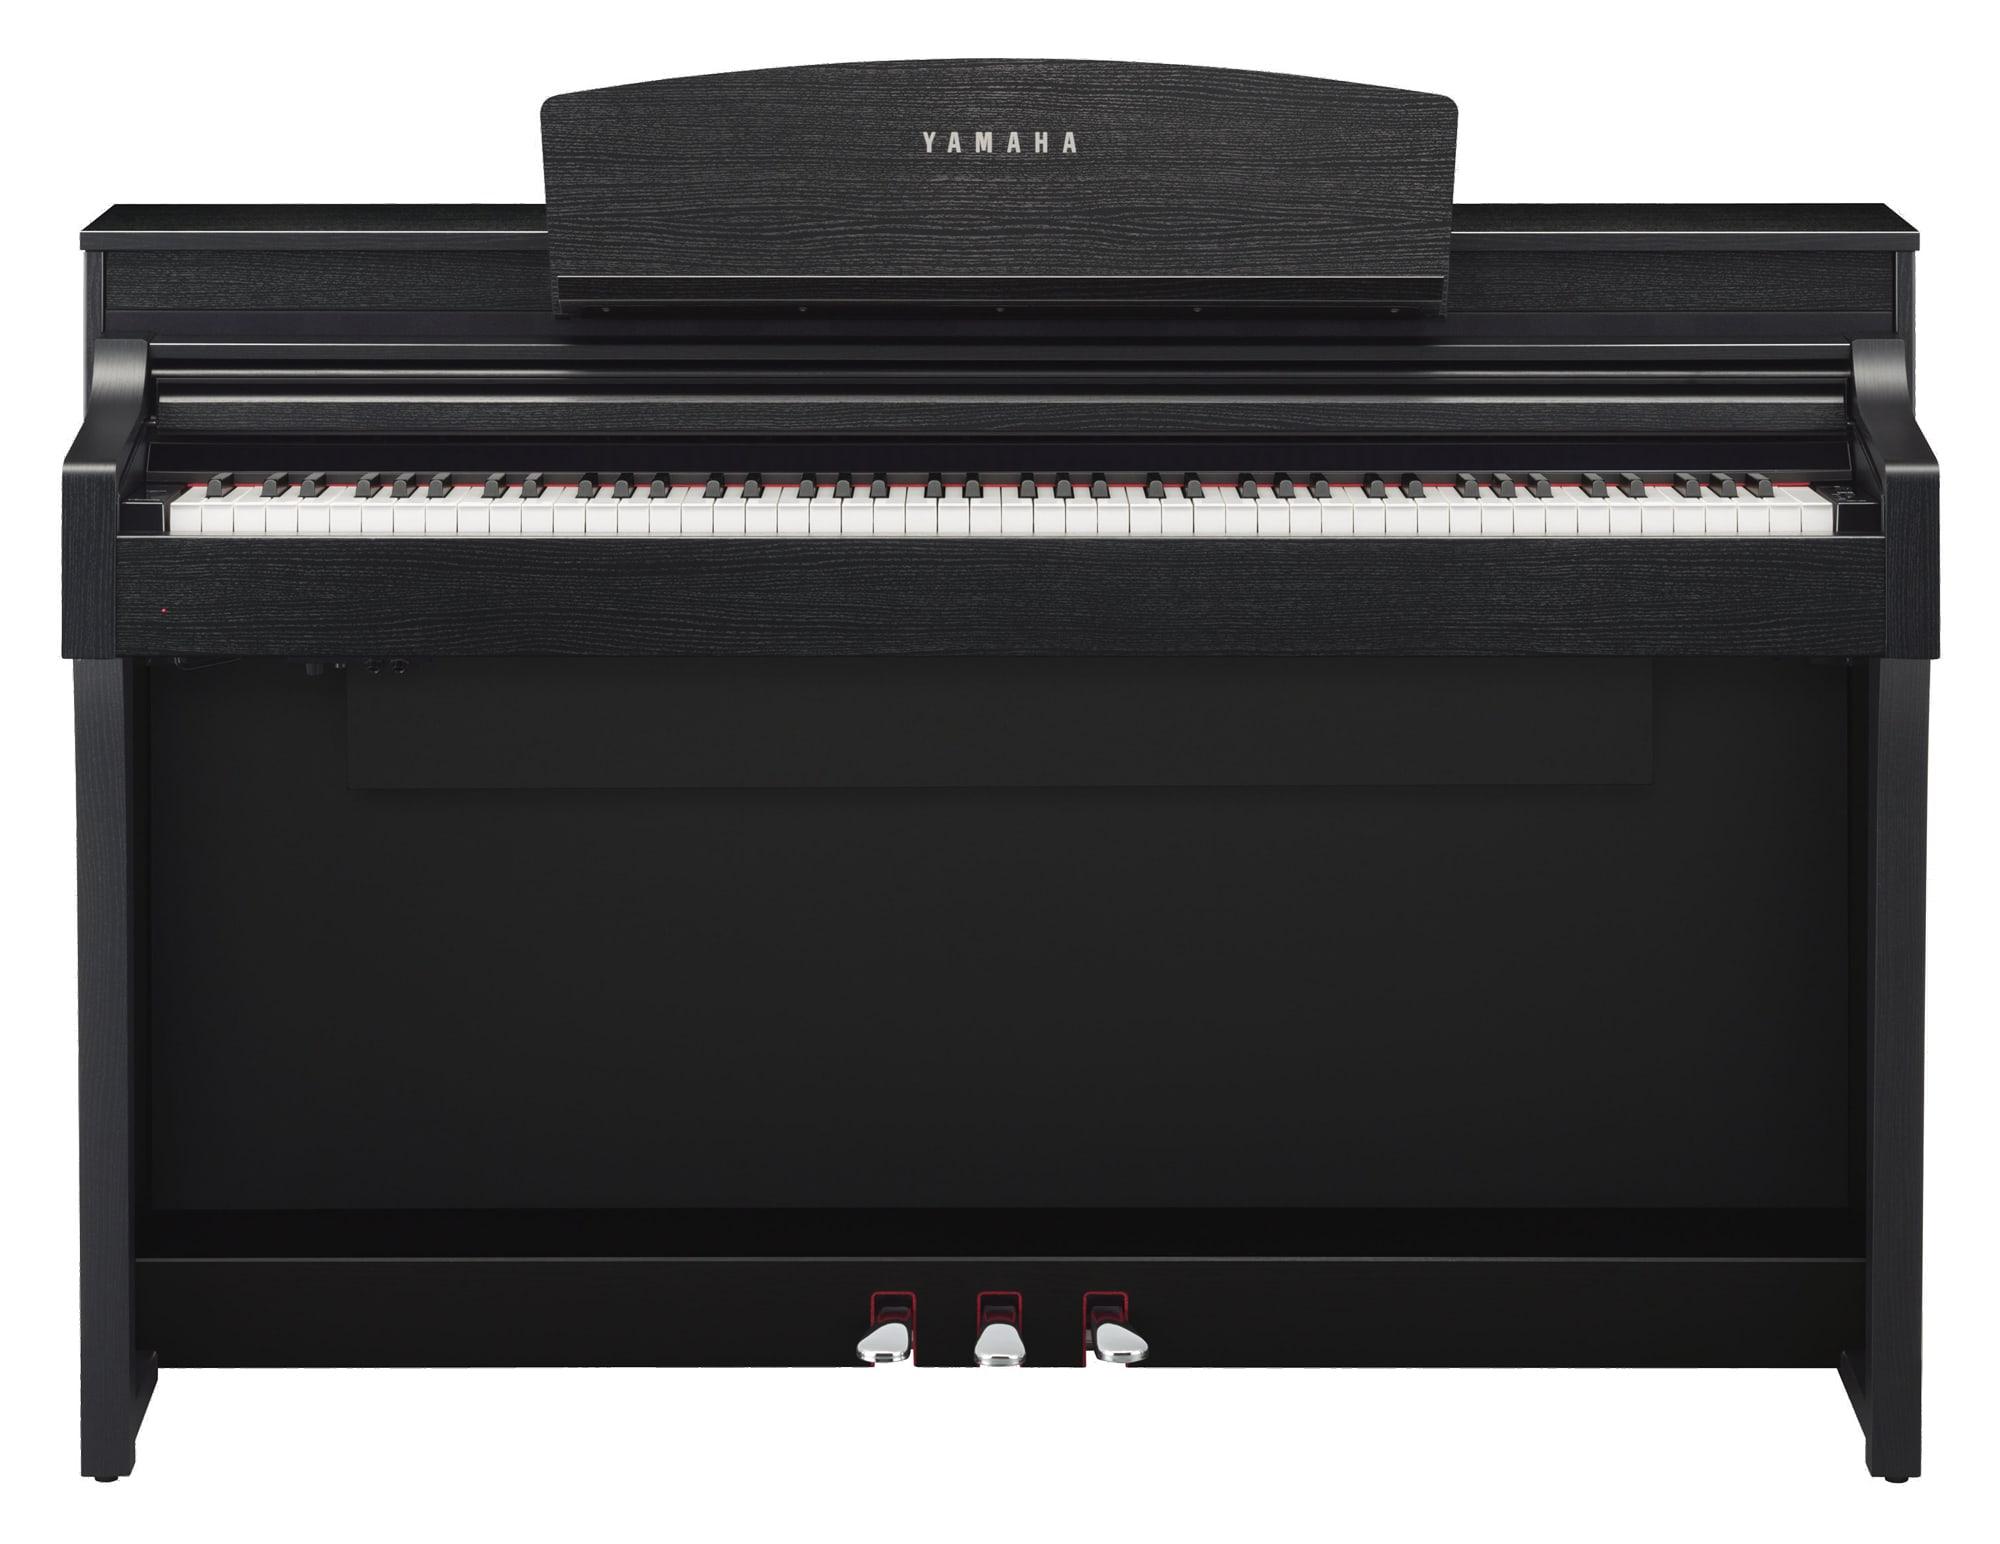 yamaha csp 150 b digitalpiano schwarz matt. Black Bedroom Furniture Sets. Home Design Ideas